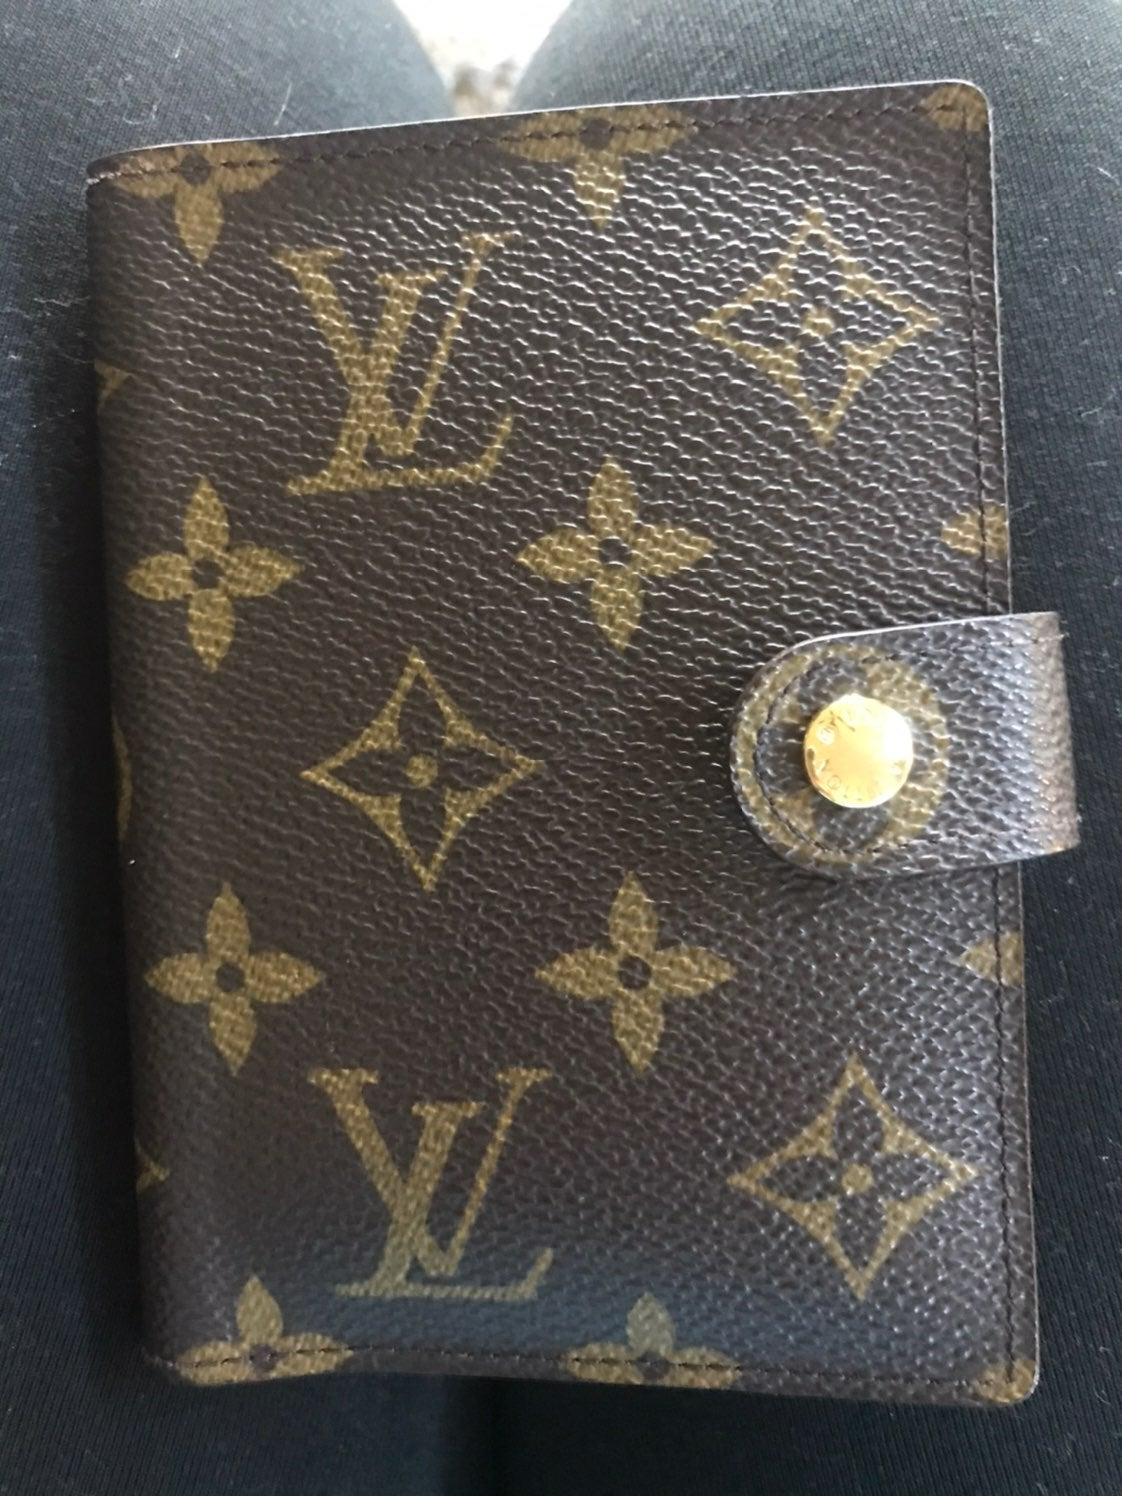 **Authentic** Louis Vuitton Agenda Cover